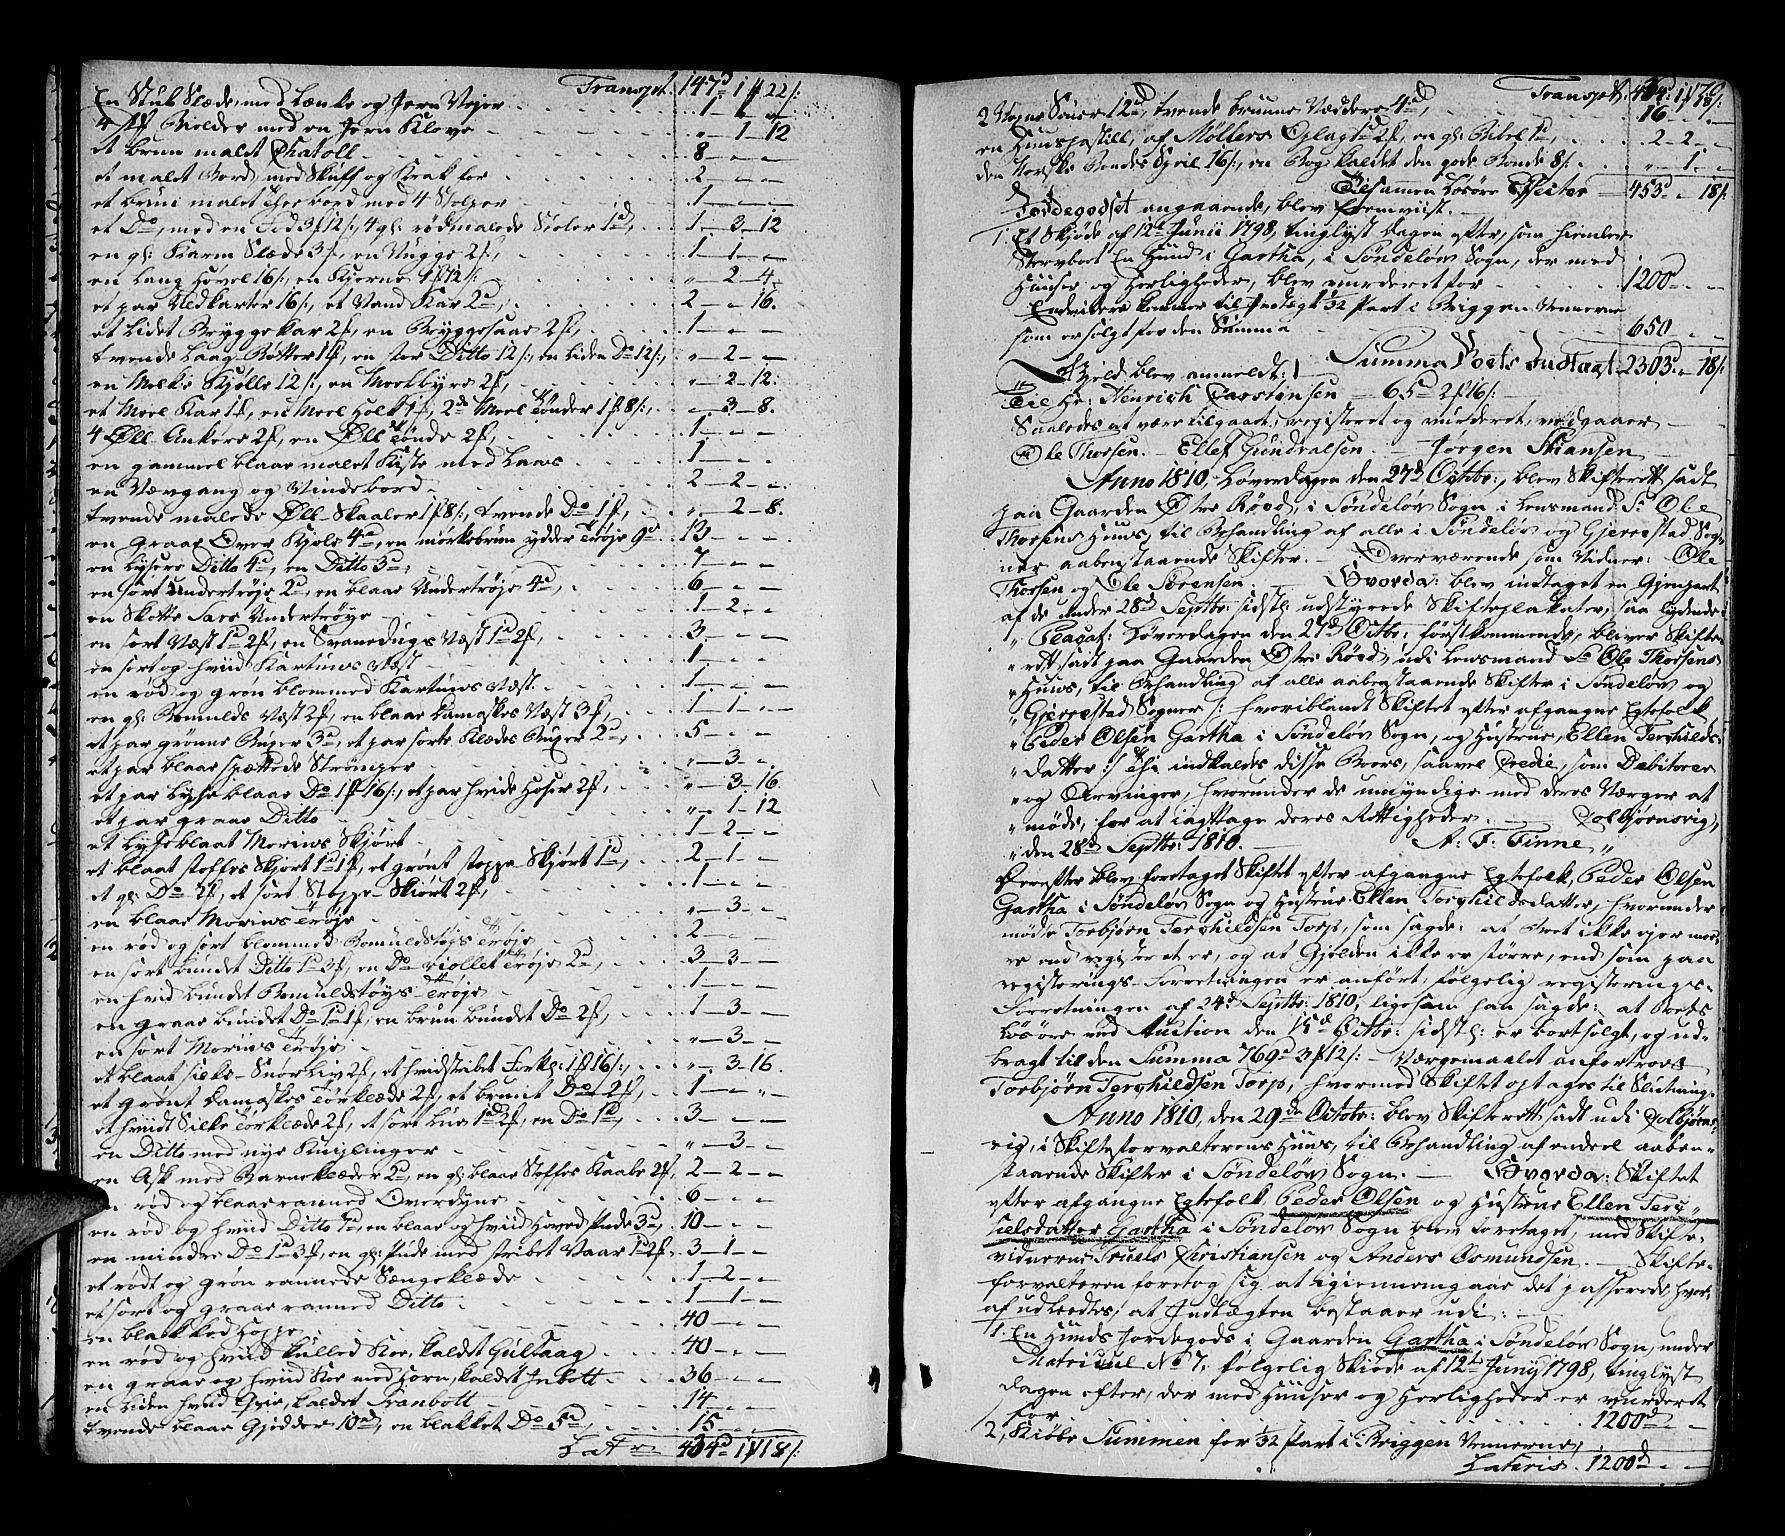 SAK, Nedenes sorenskriveri før 1824, H/Hc/L0053: Skifteprotokoll med register nr 38, 1807-1812, s. 69b-70a